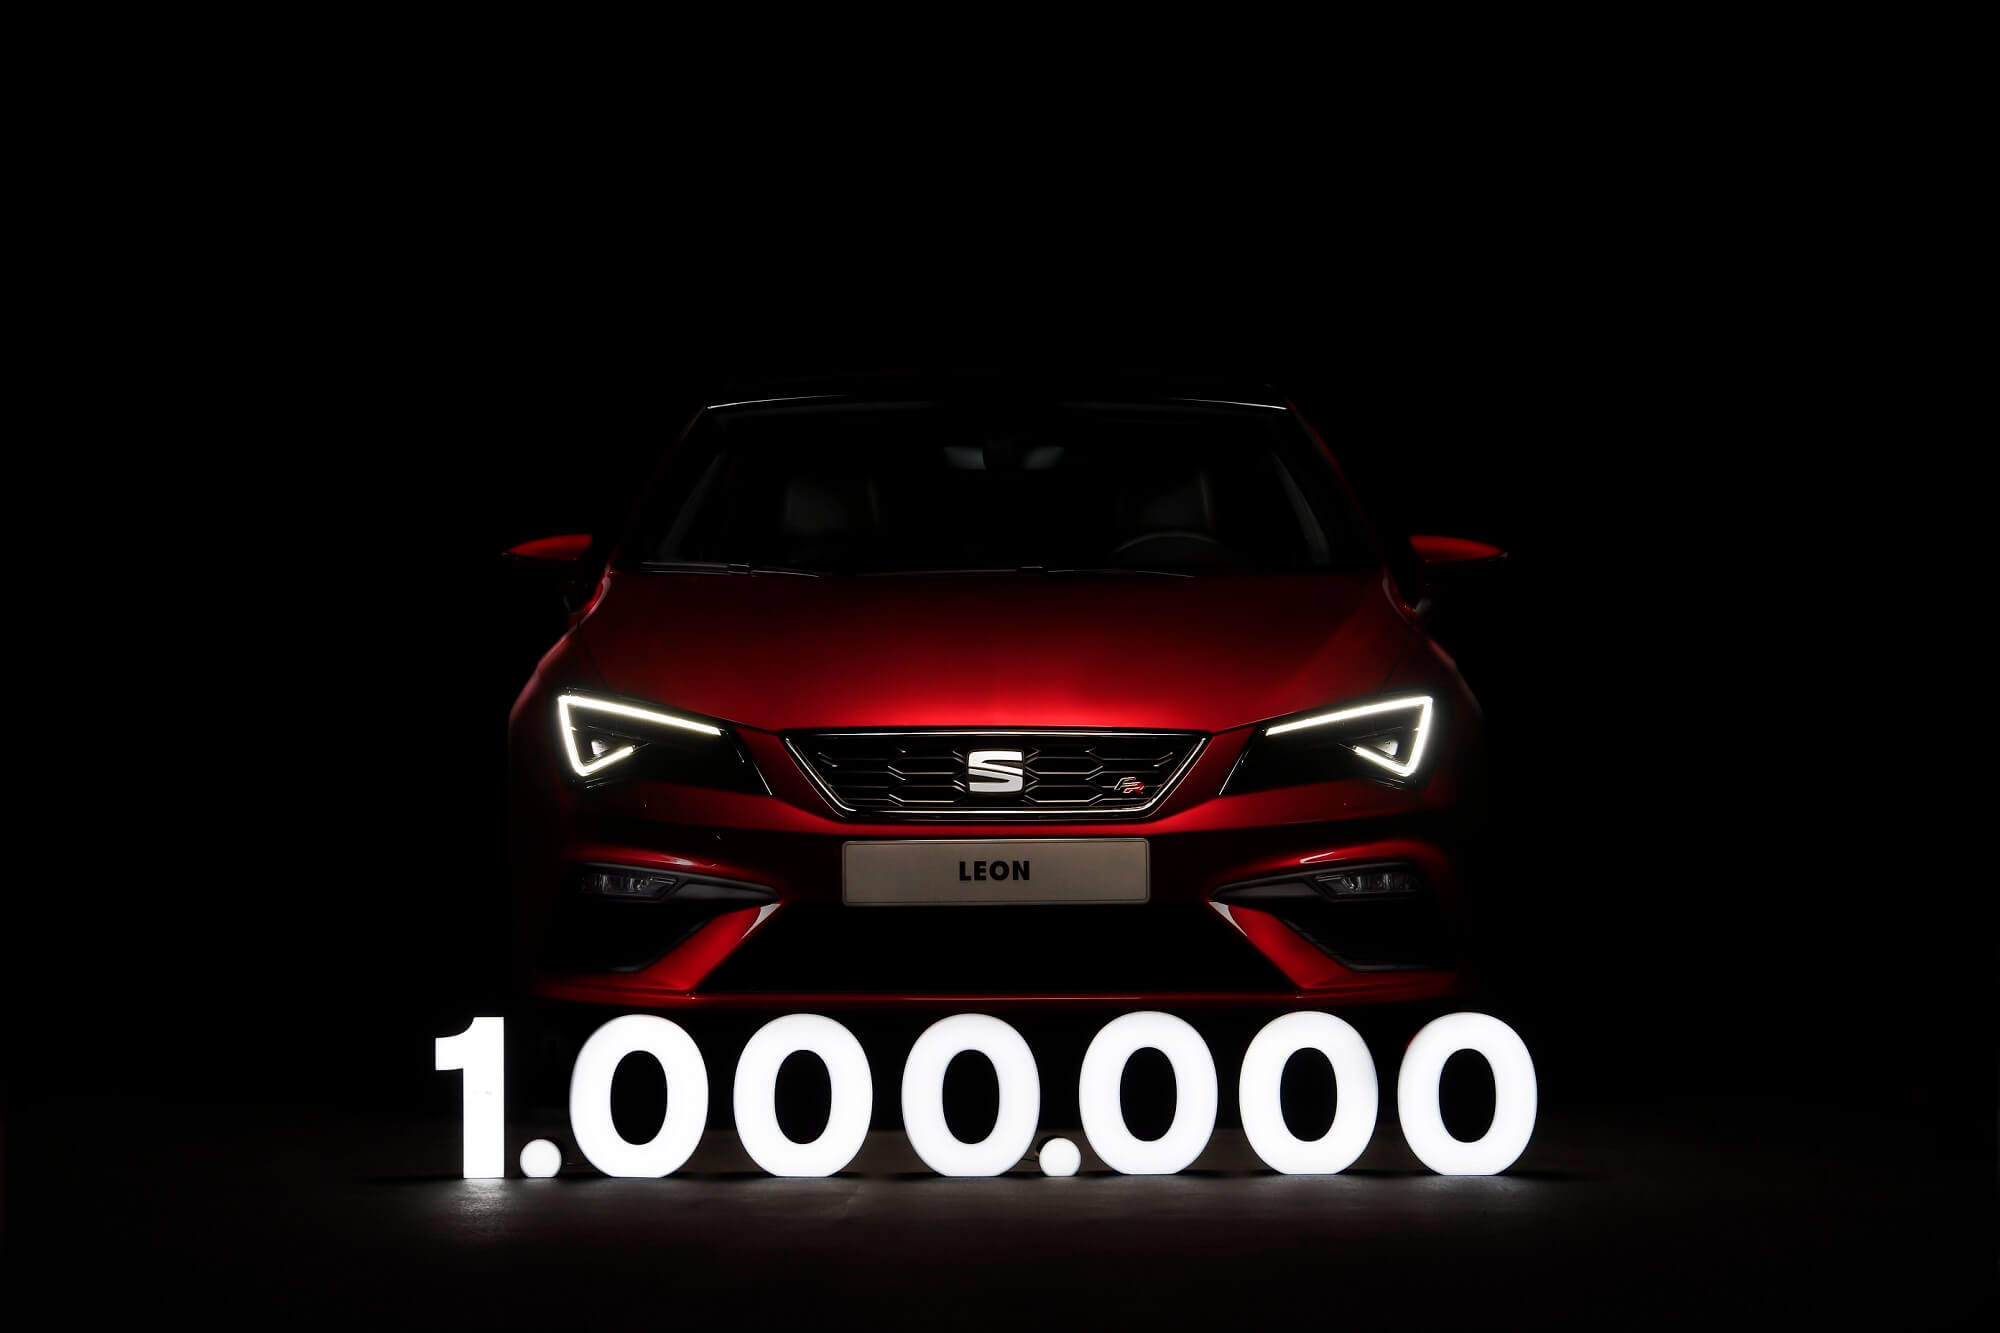 SEAT Leon 1 milhão